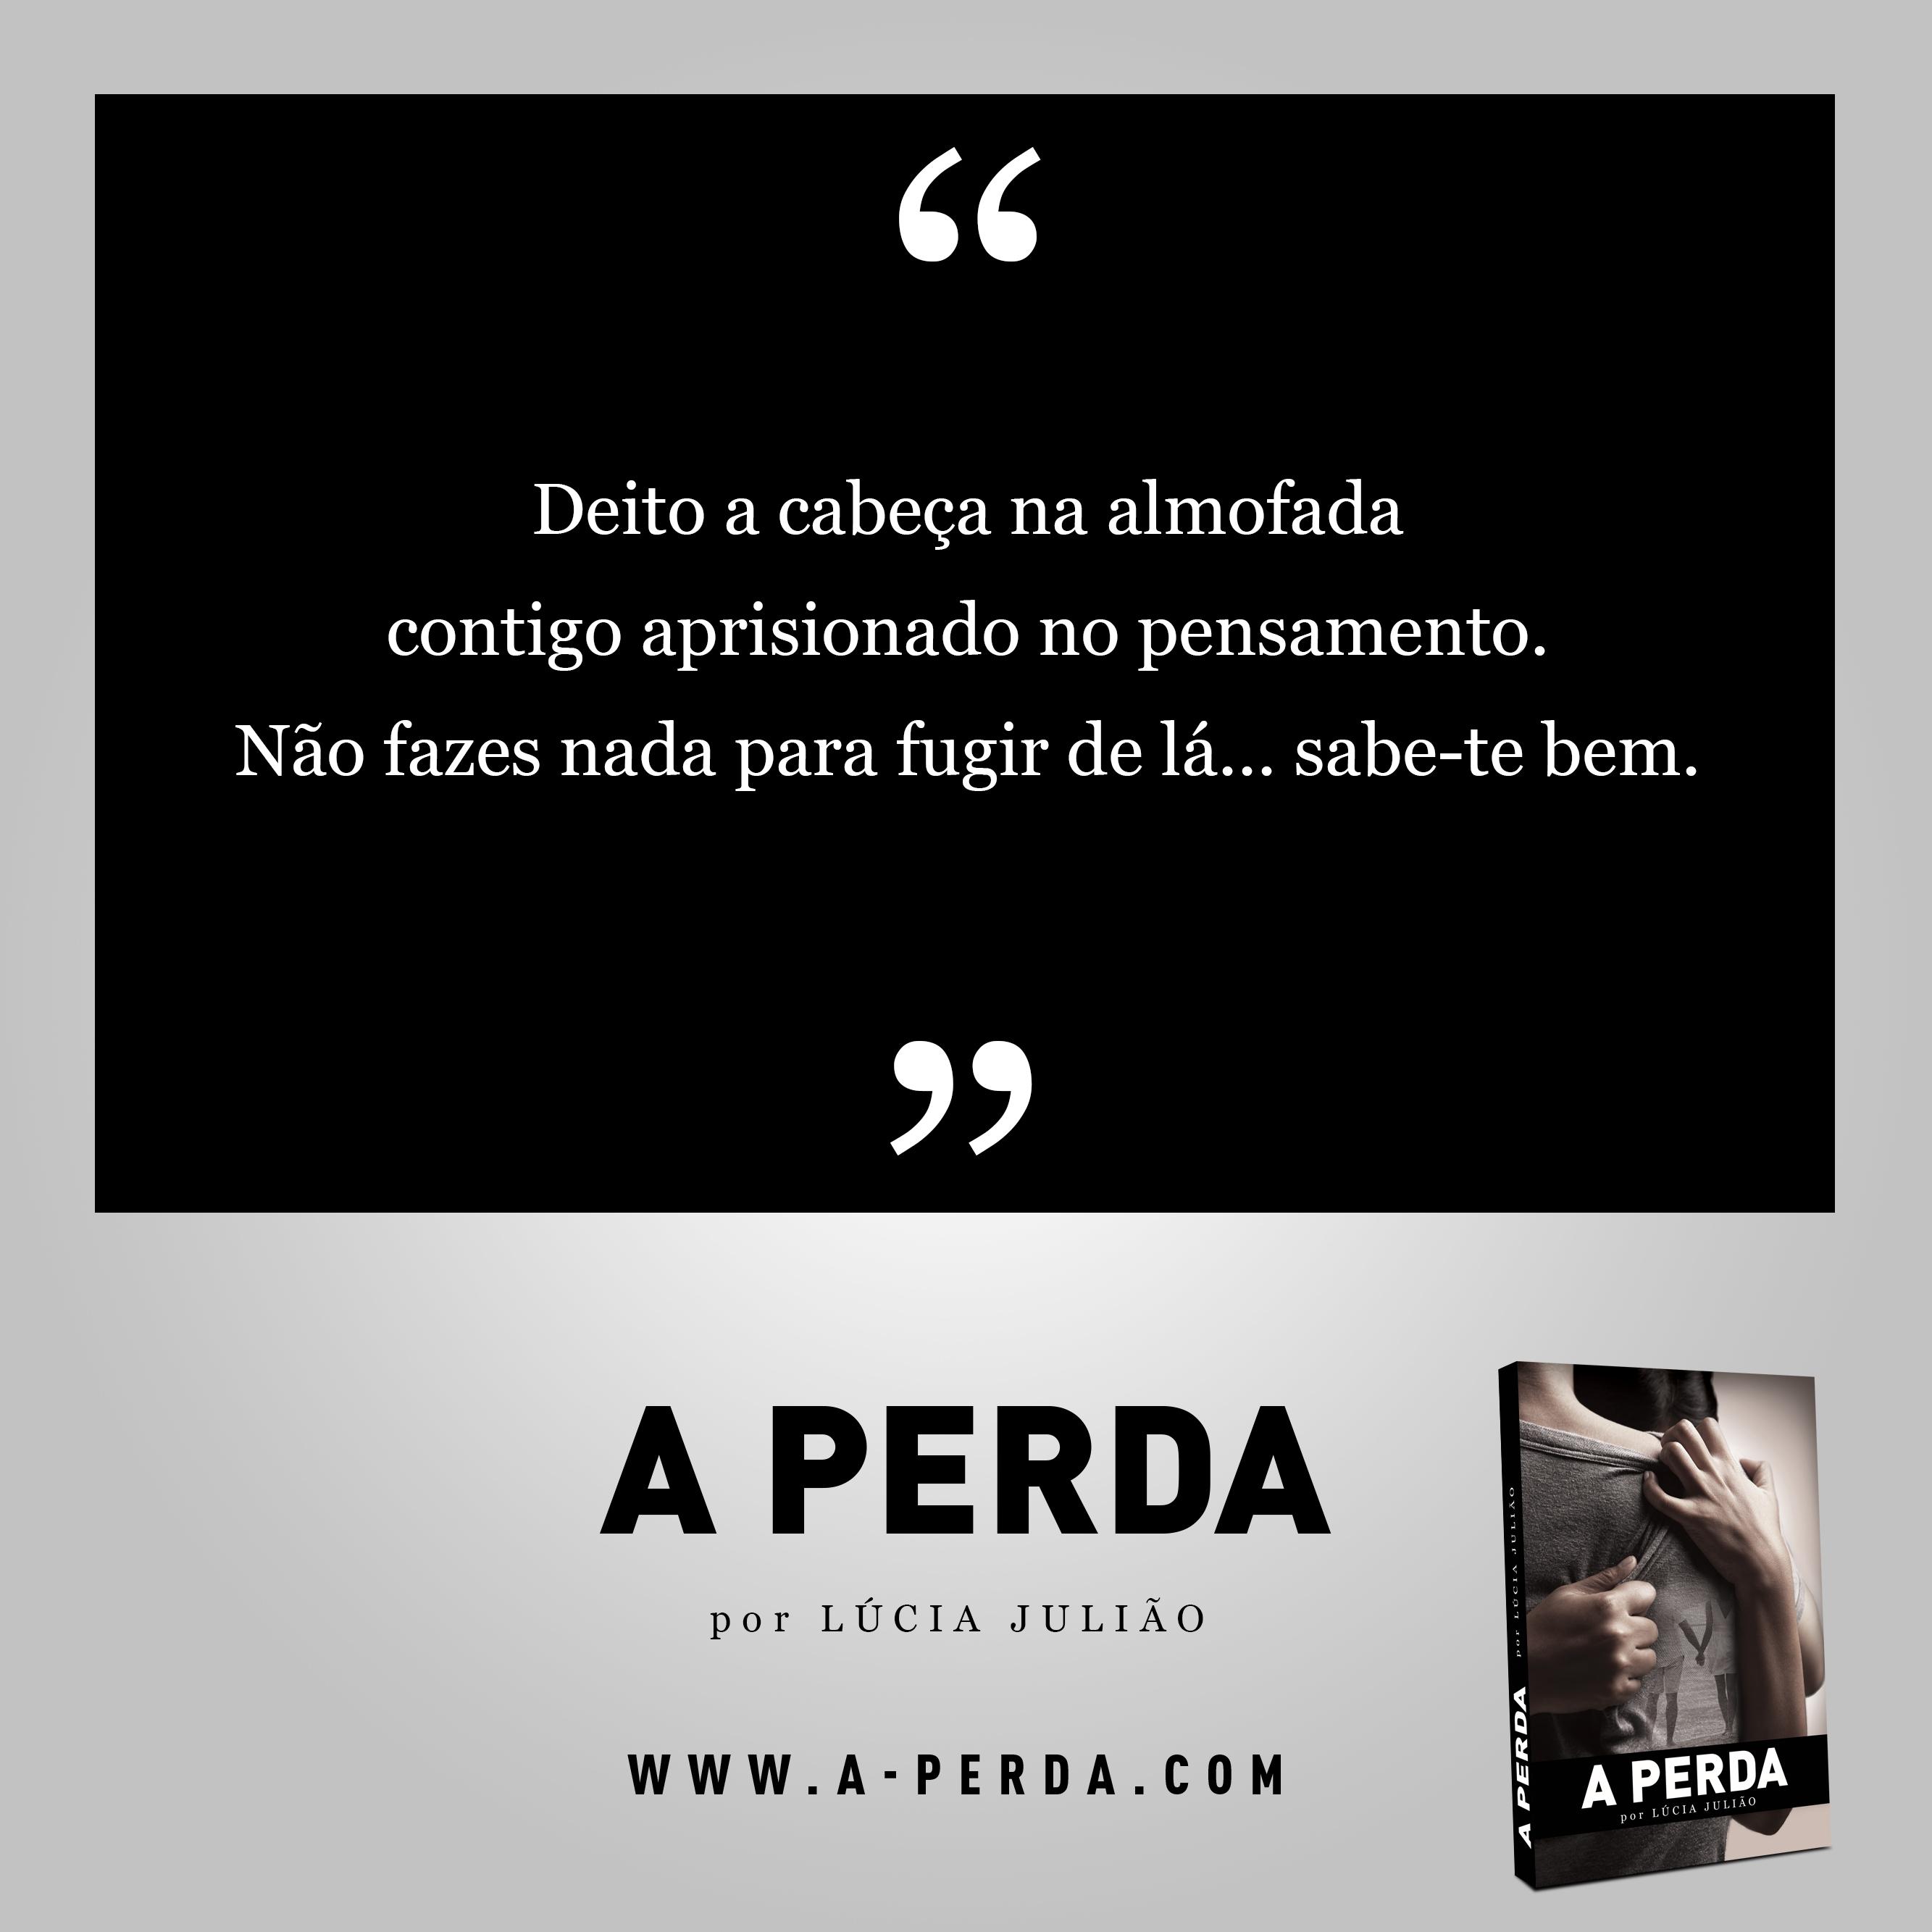 043-capitulo-45-livro-a-Perda-de-Lucia-Juliao-Instagram